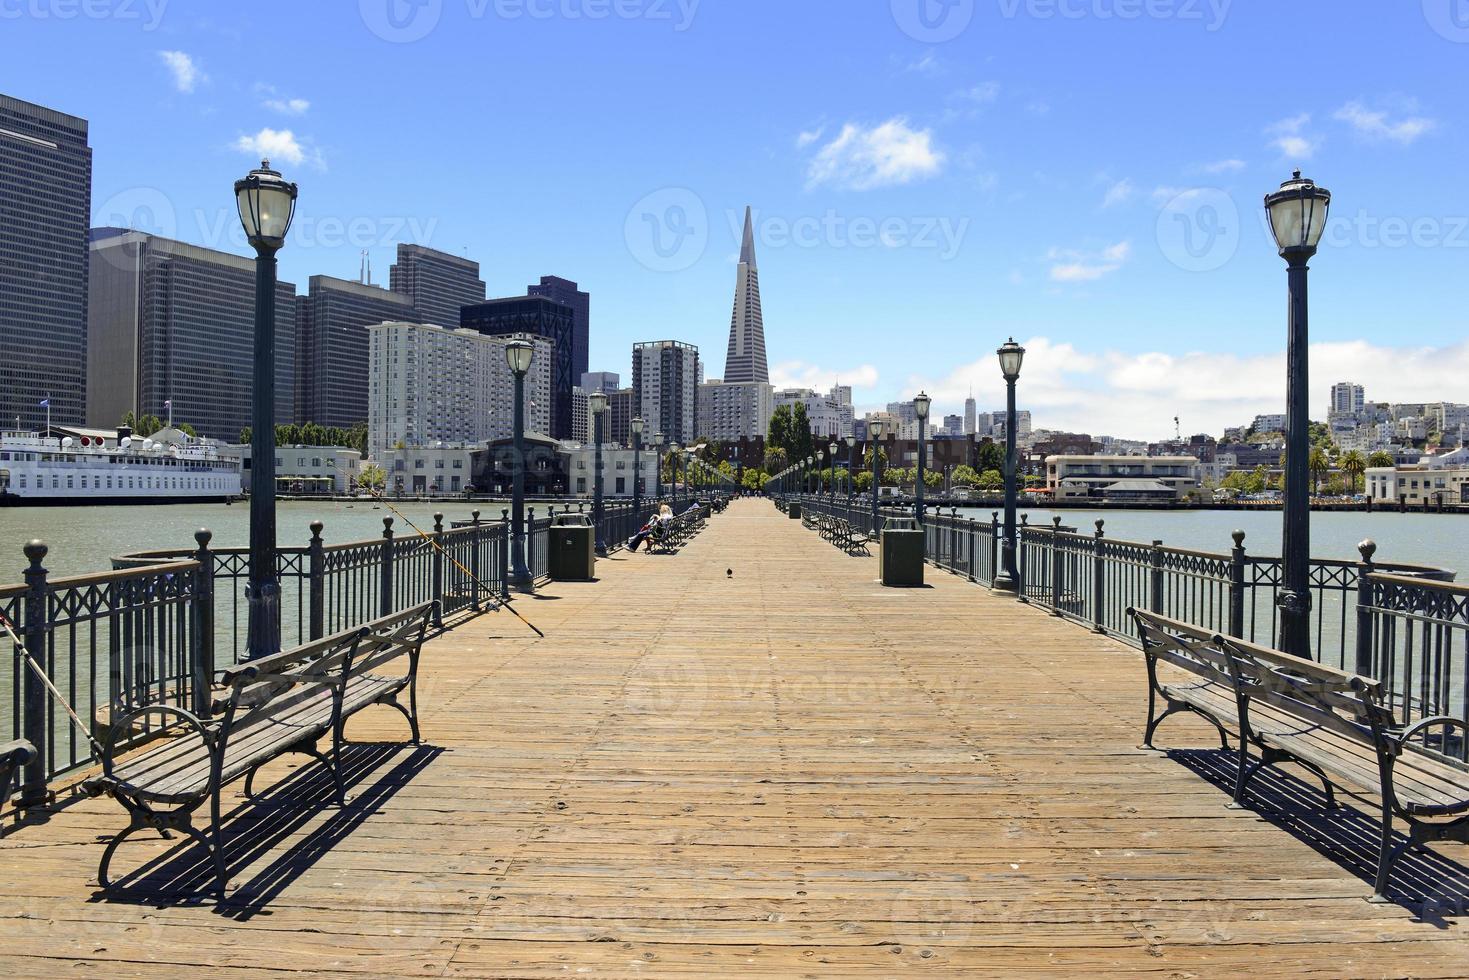 Pier and San Francisco city Skyline, California photo